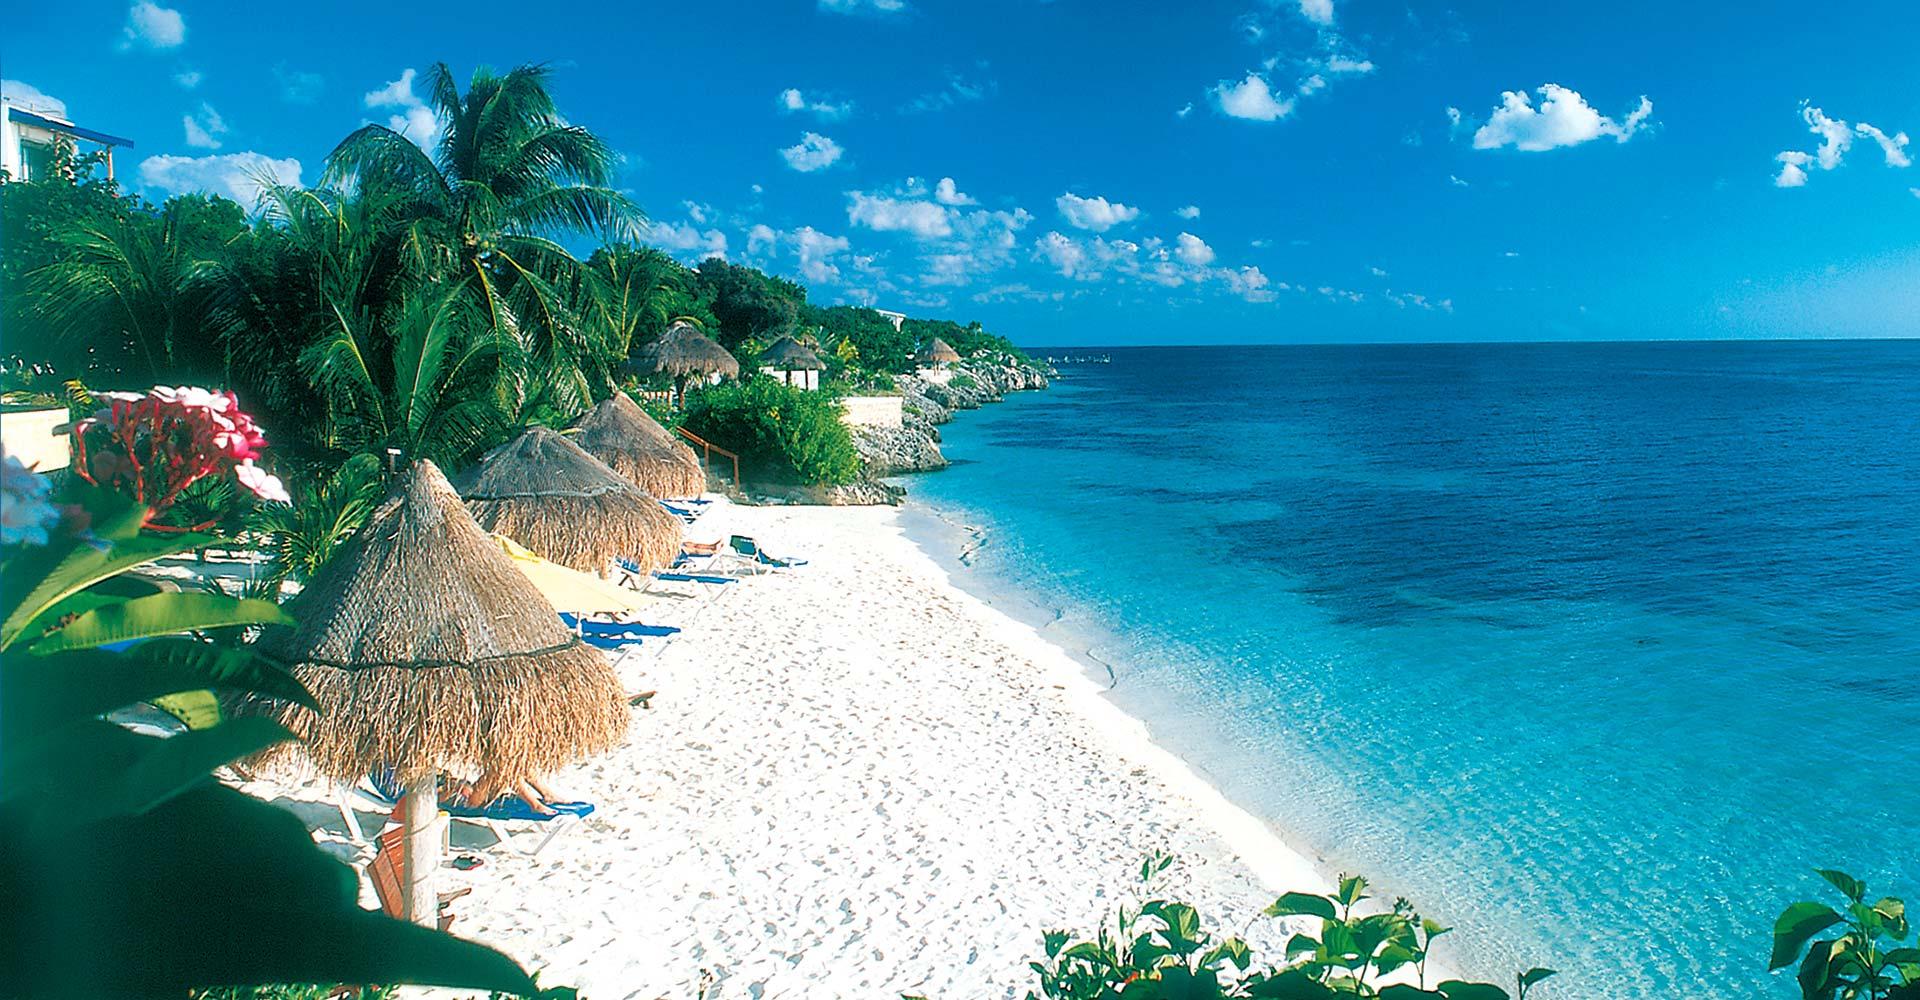 Mexiko_weisser Sandstrand_tuerkisblaues Meer_Mexico_Reisen